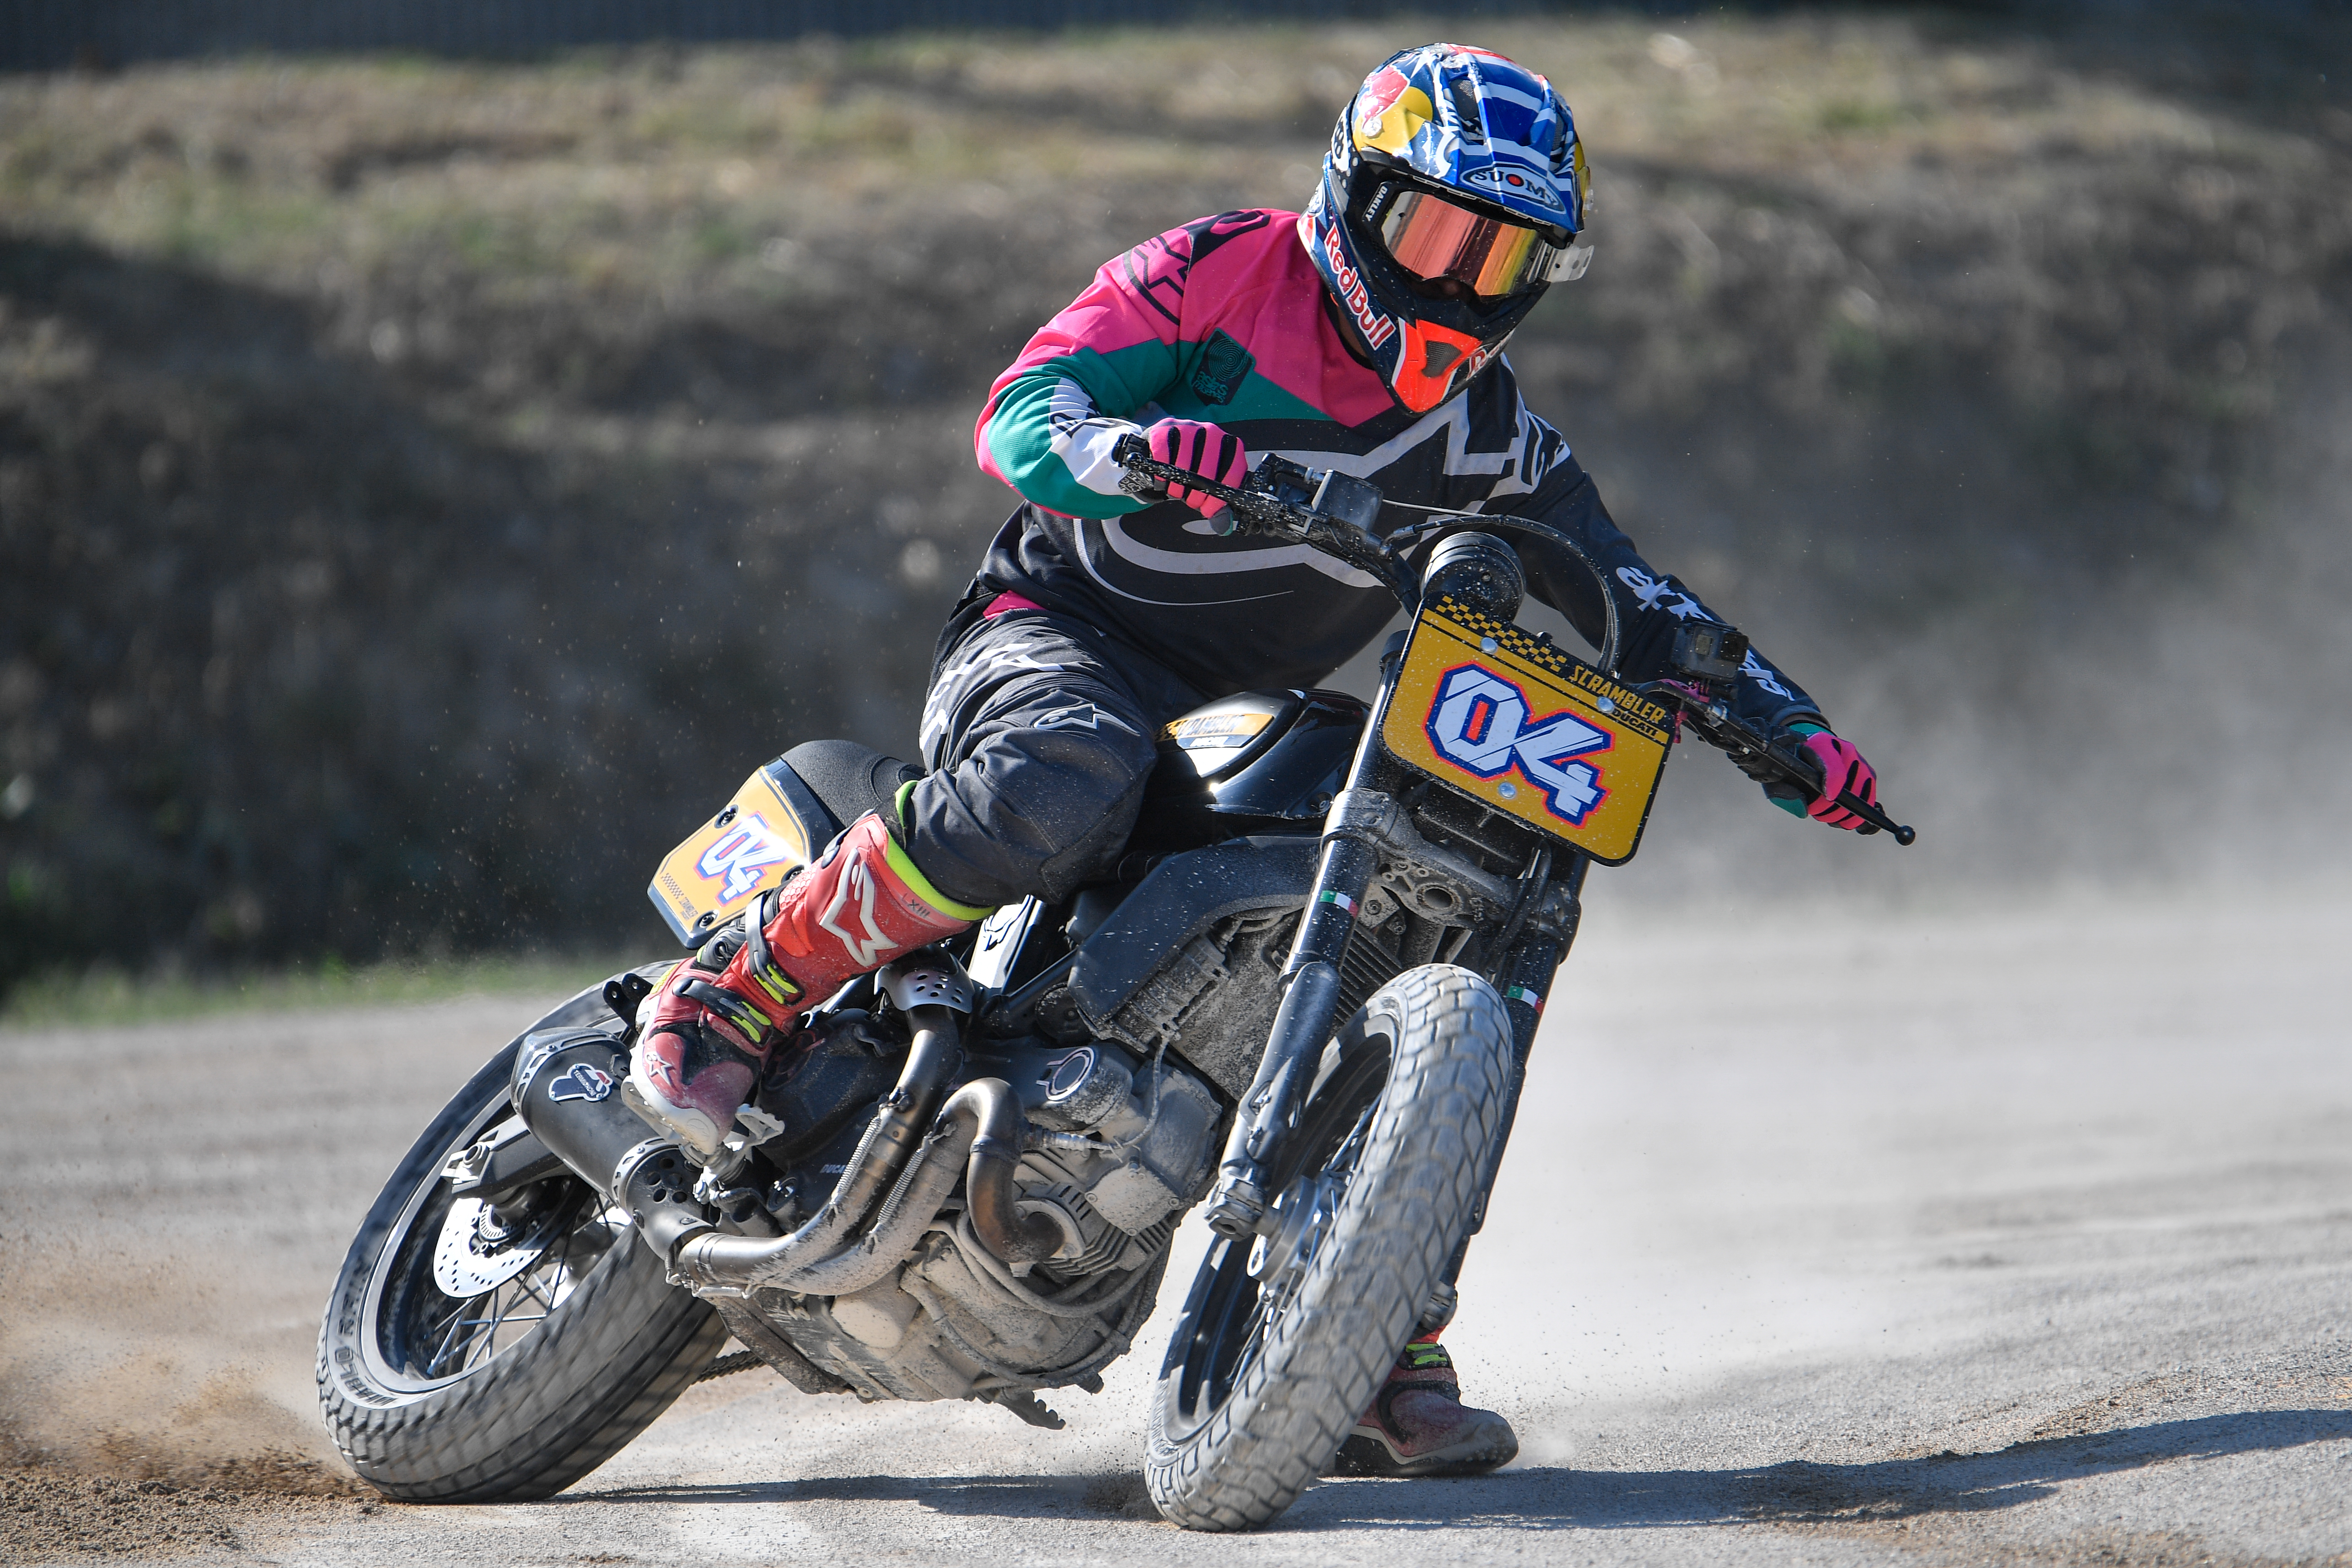 WDW2018 Scrambler - Flat Track Race